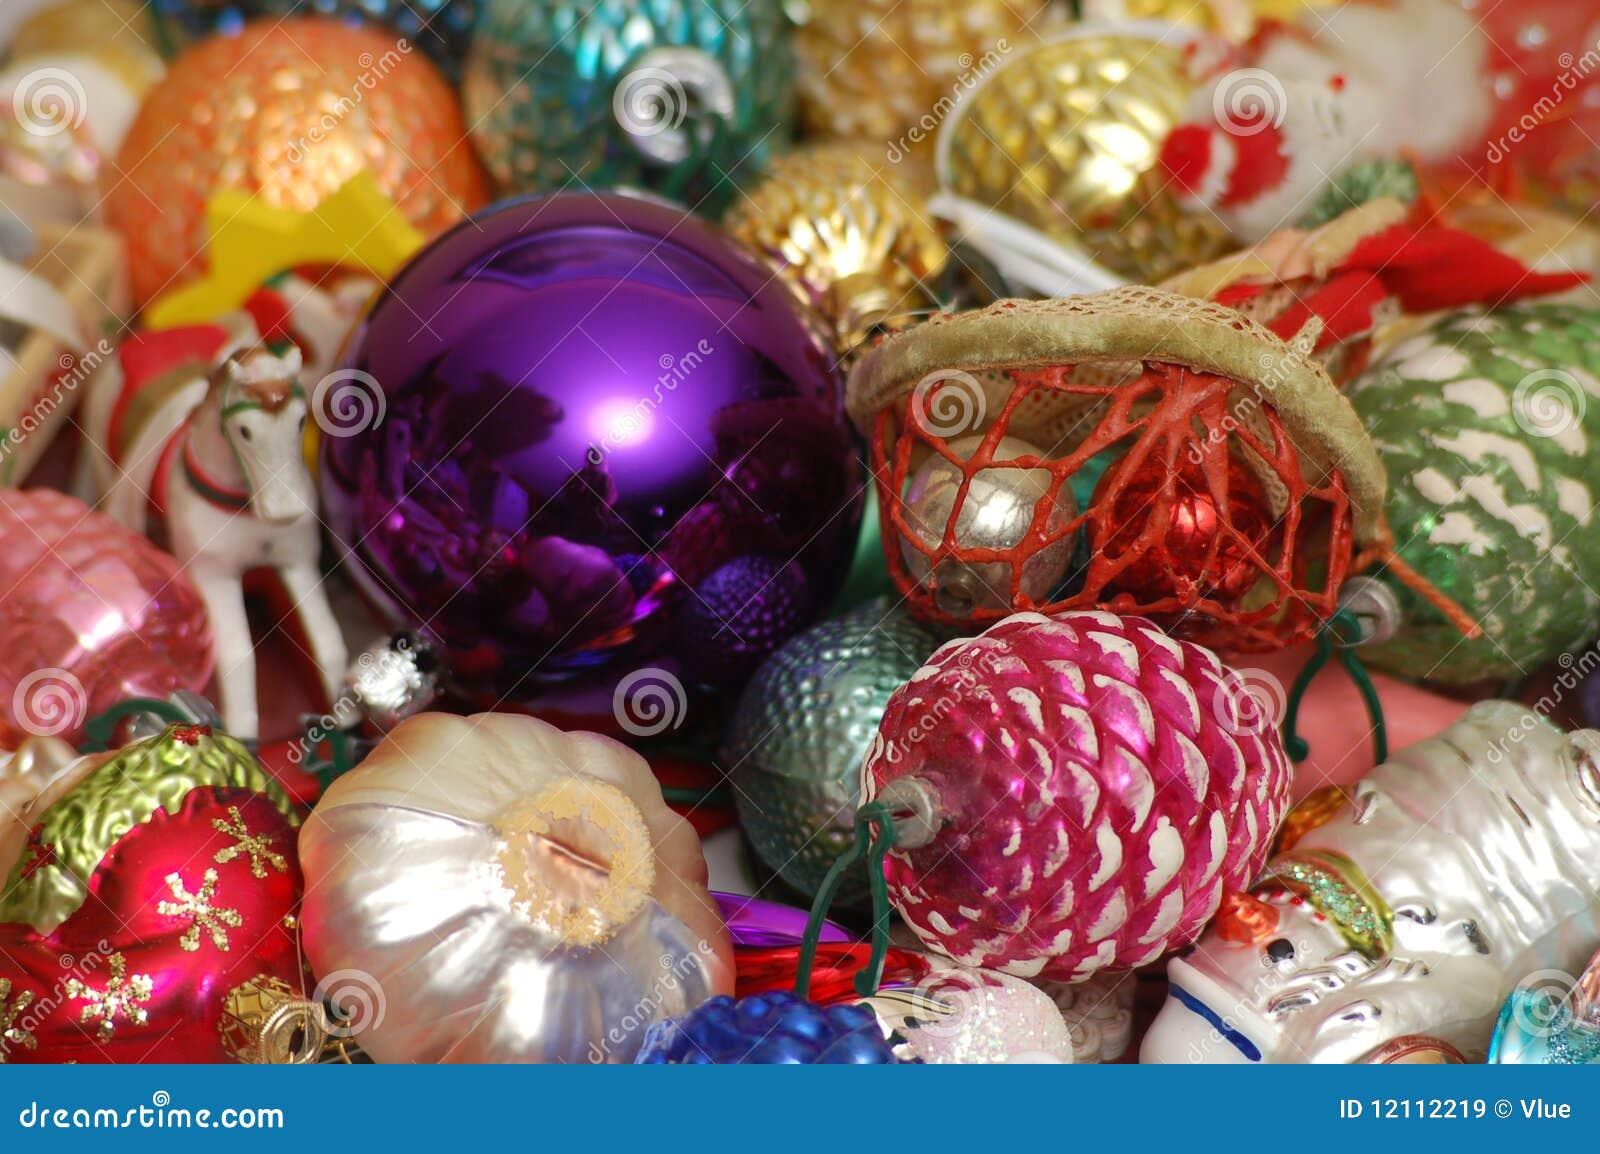 Christmas Ornaments Assortment